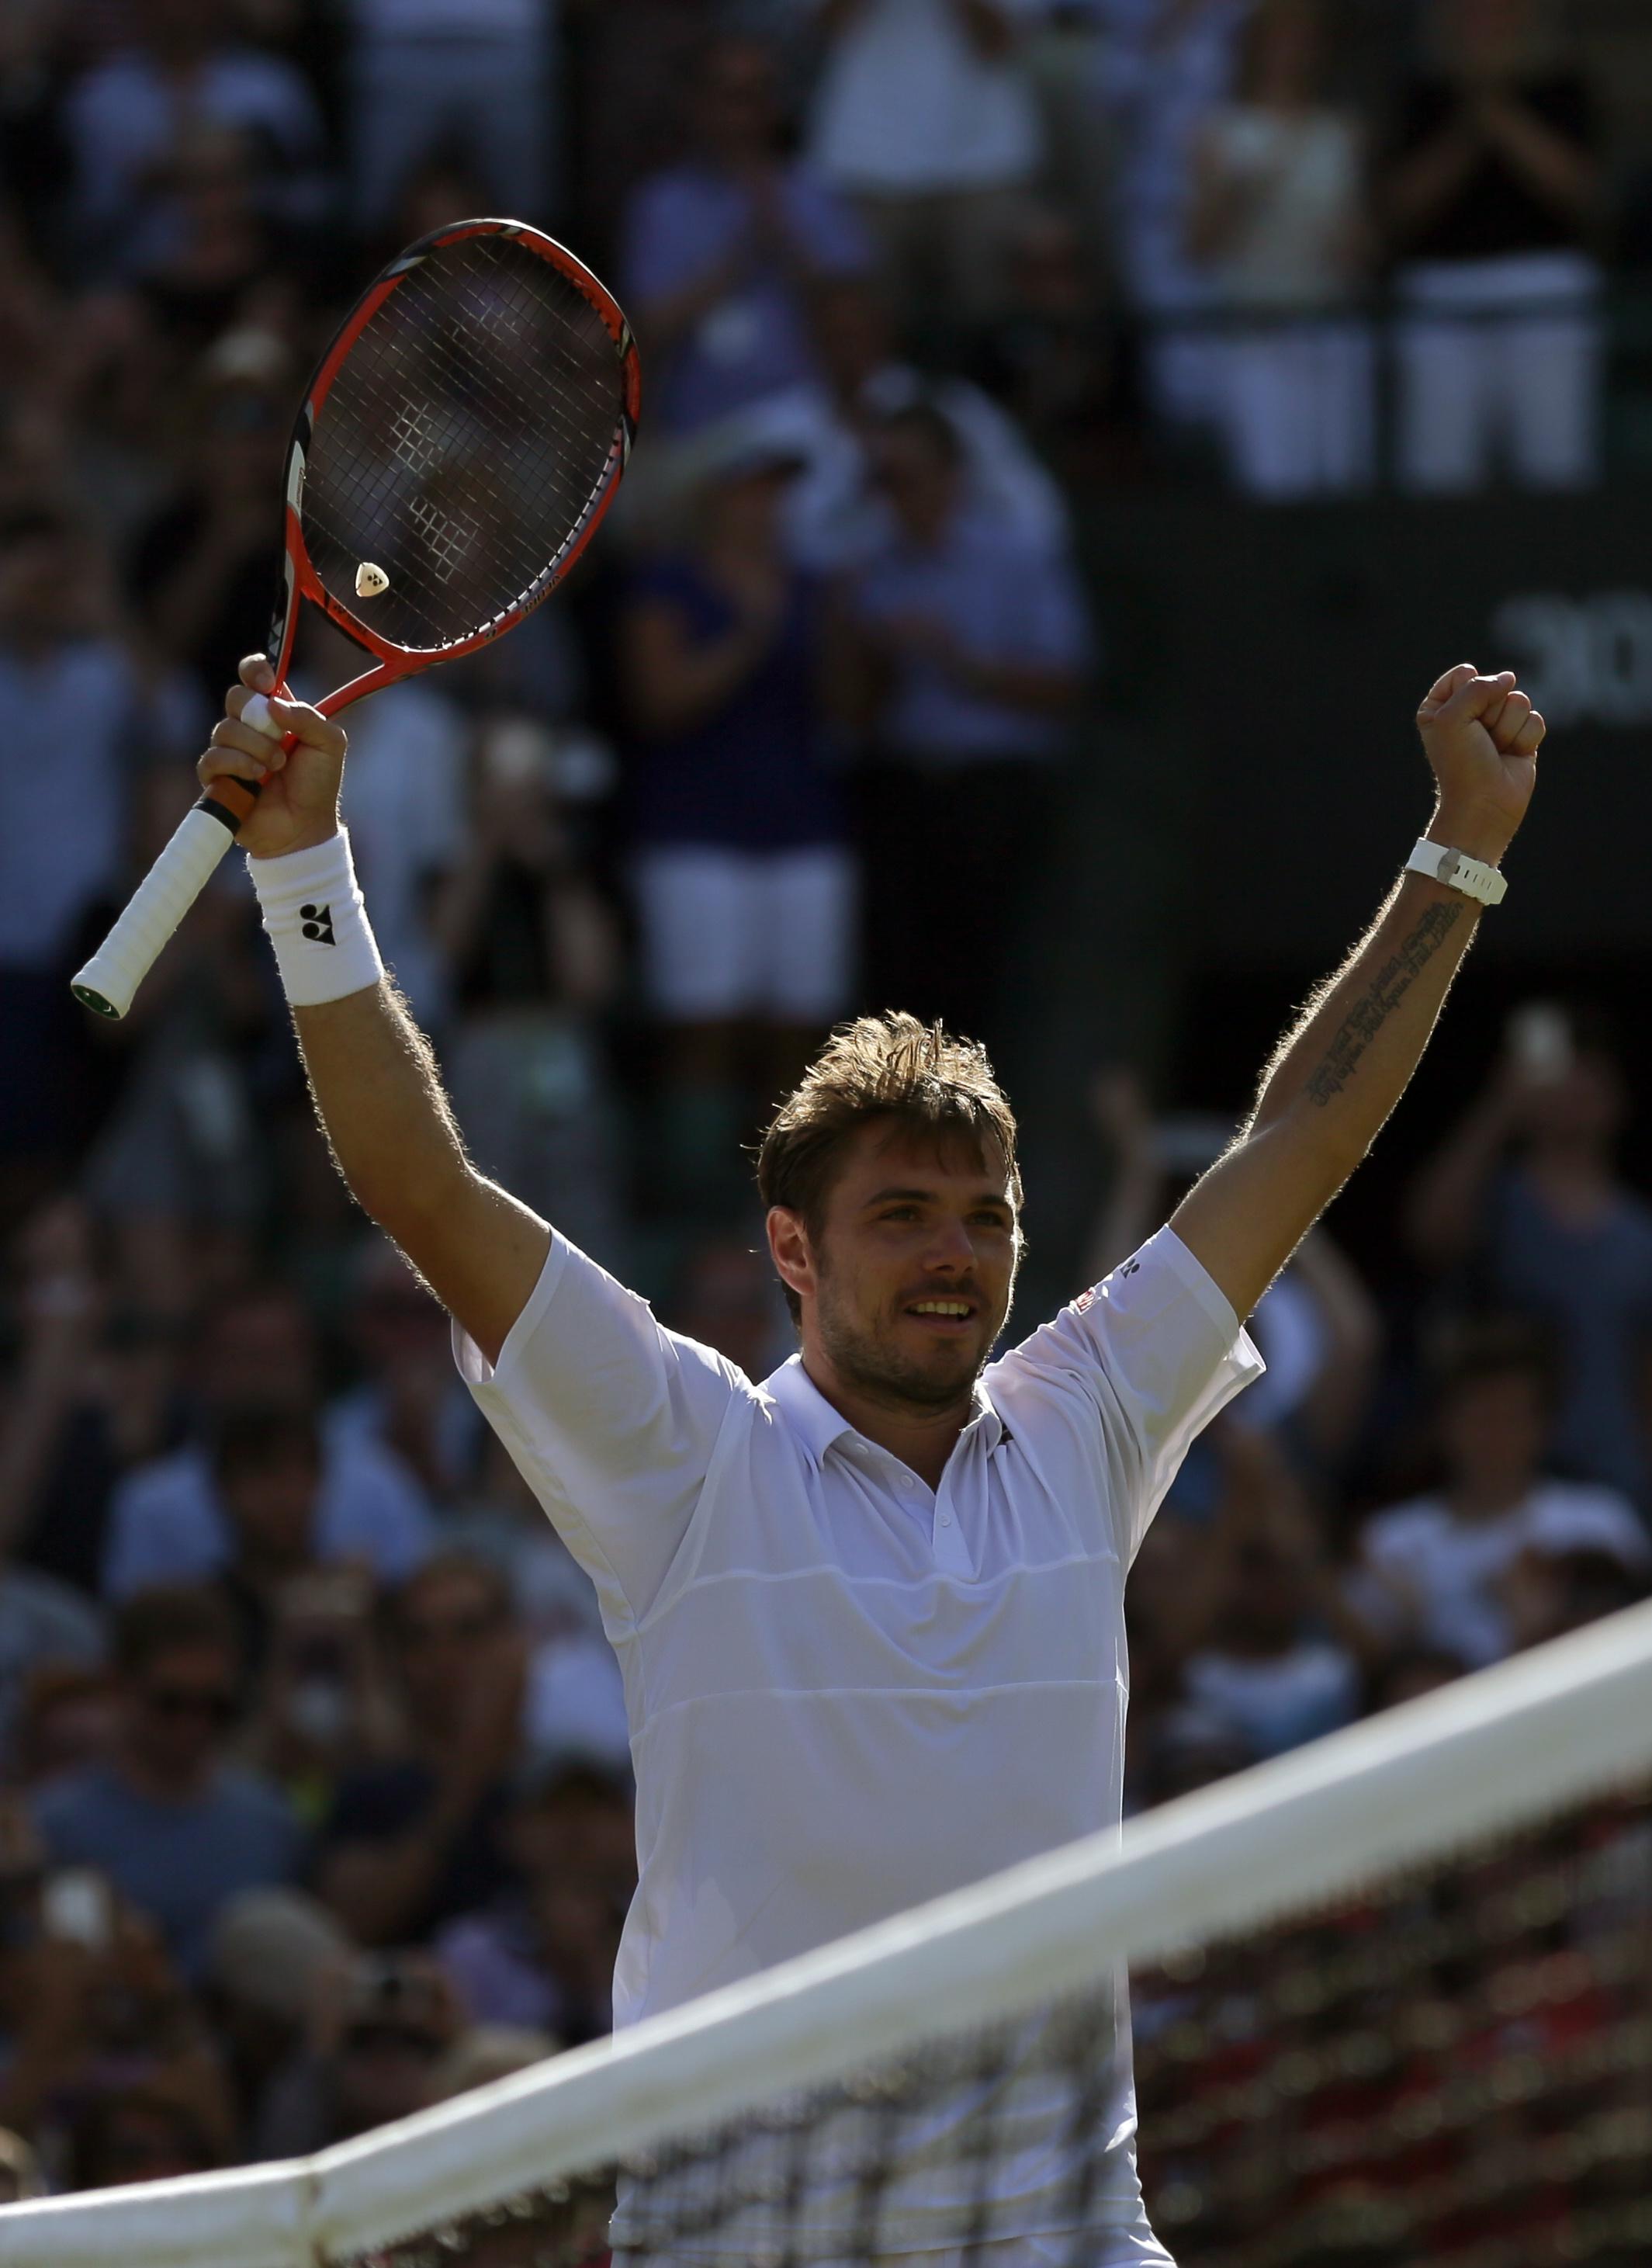 Stan Wawrinka of Switzerland celebrates winning the match against David Goffin of Belgium, at the All England Lawn Tennis Championships in Wimbledon, London, Monday July 6, 2015. Wawrinka won the match 7-6, 7-6, 6-4. (AP Photo/Tim Ireland)